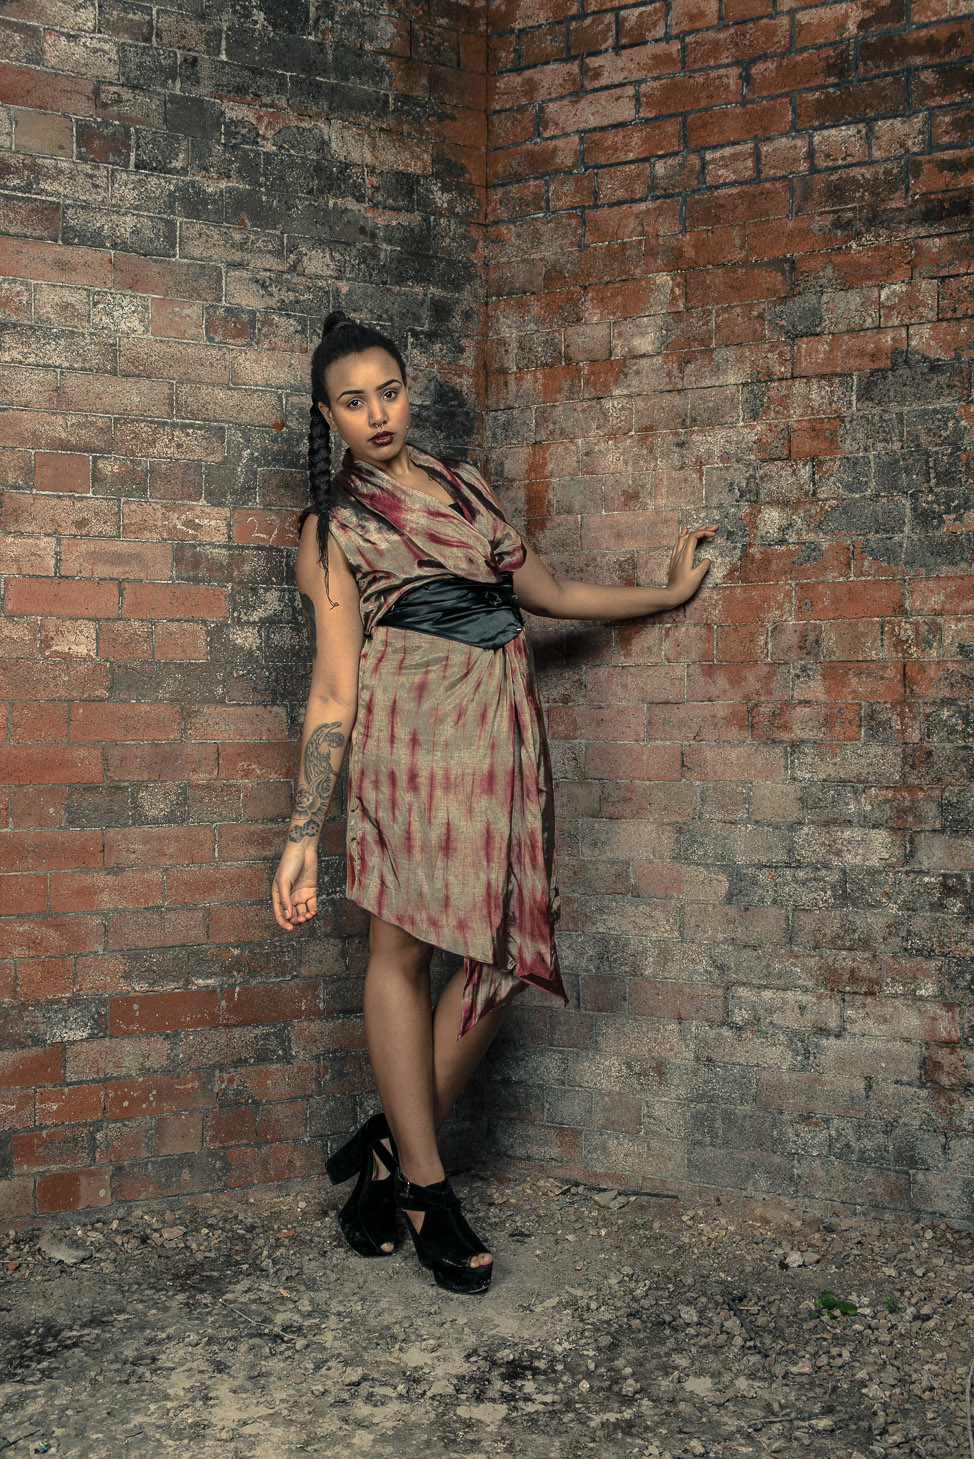 zaramia-ava-zaramiaava-leeds-fashion-designer-ethical-sustainable-tailored-minimalist-dress-emi-jacket-versatile-drape-print-bodysuit-black-obi-belt-wrap-cowl-styling-womenswear-models-photoshoot-28